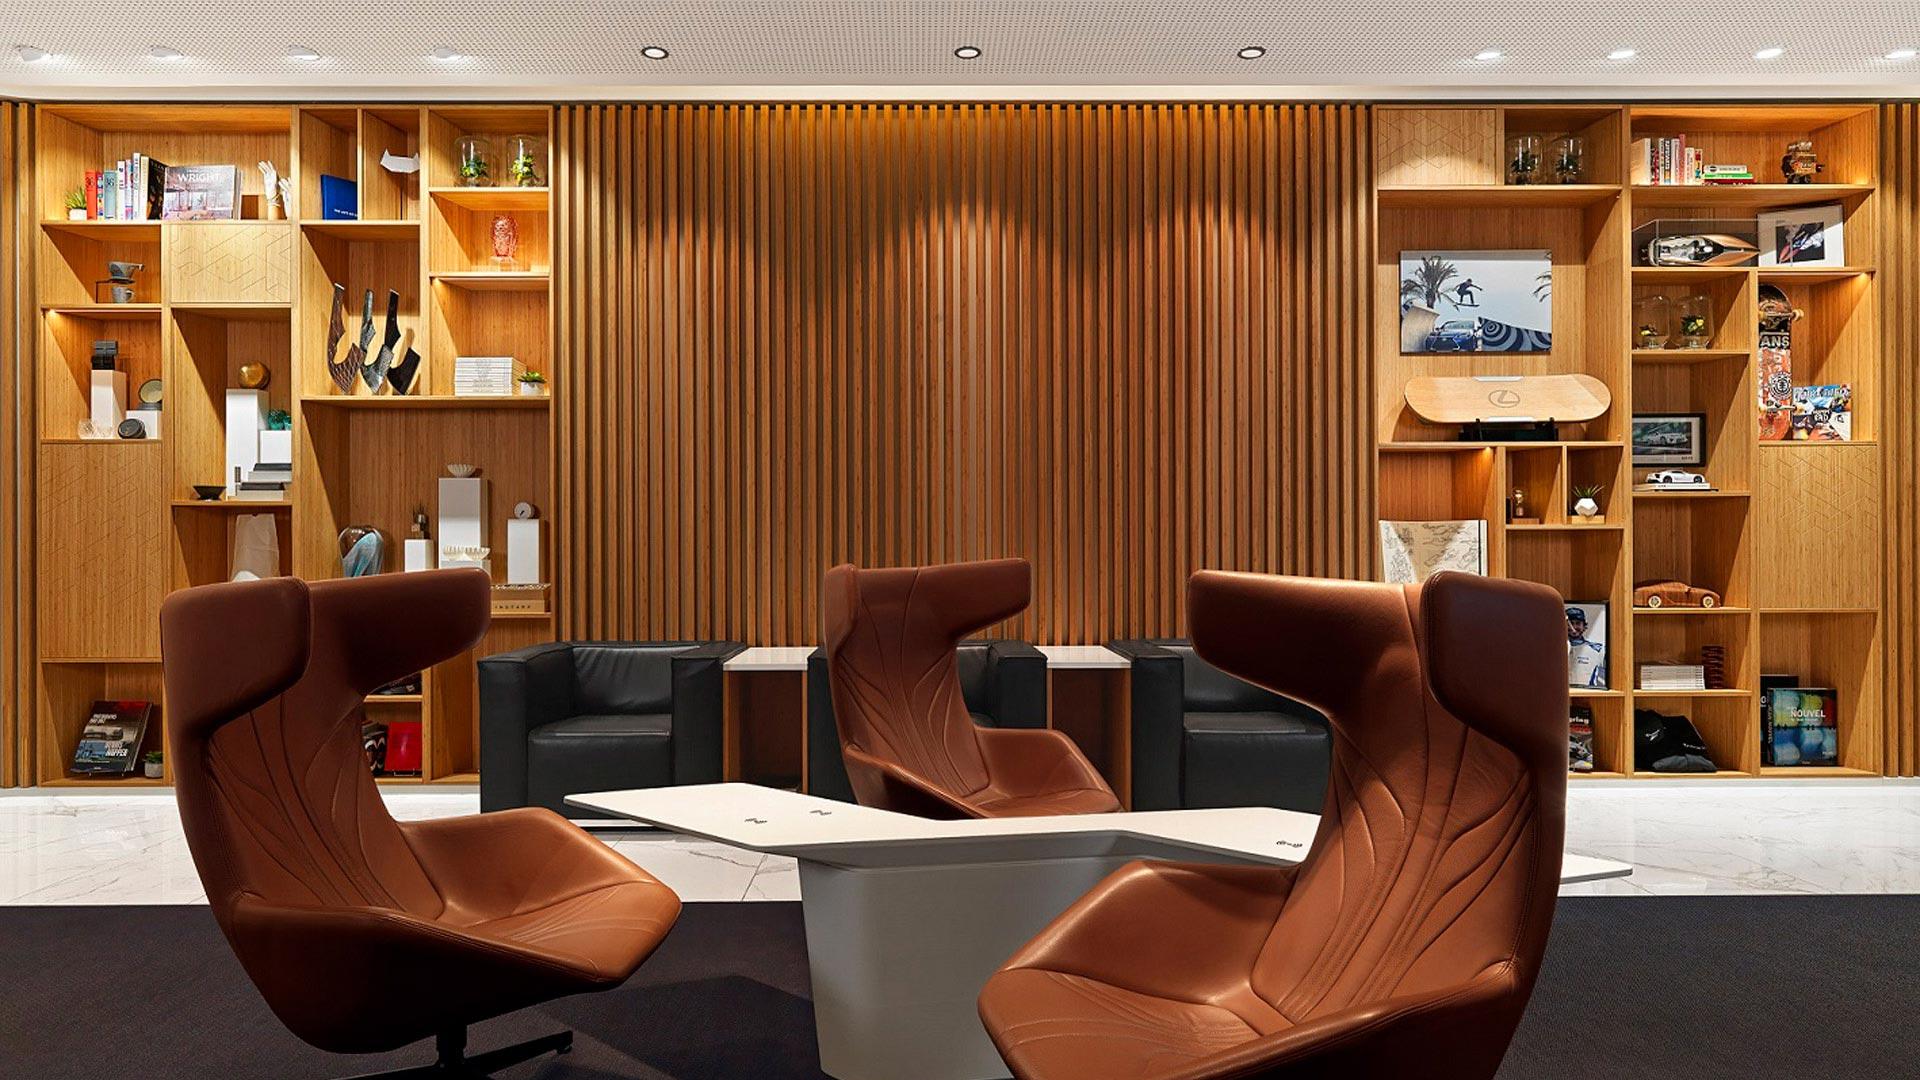 Lexus Lounge alani 1920x1080 v2